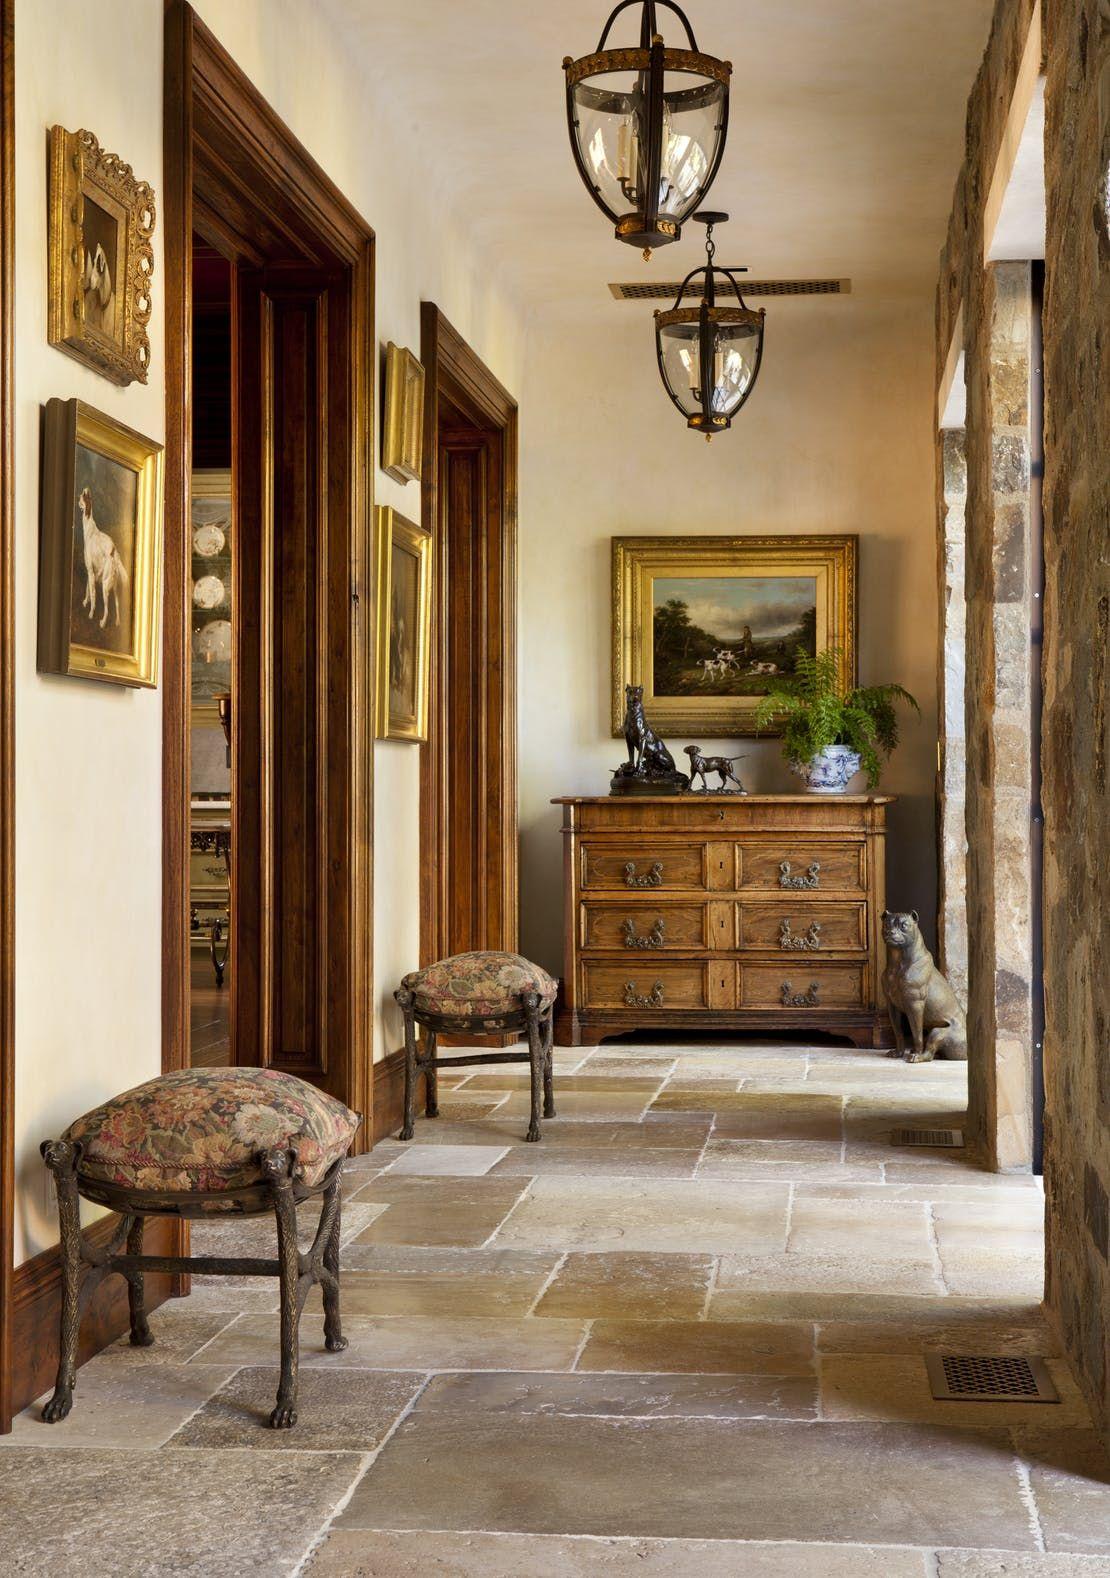 English Tudor Interior Design Ideas: English Tudor Hallway TraditionalNeoclassical By Linda L